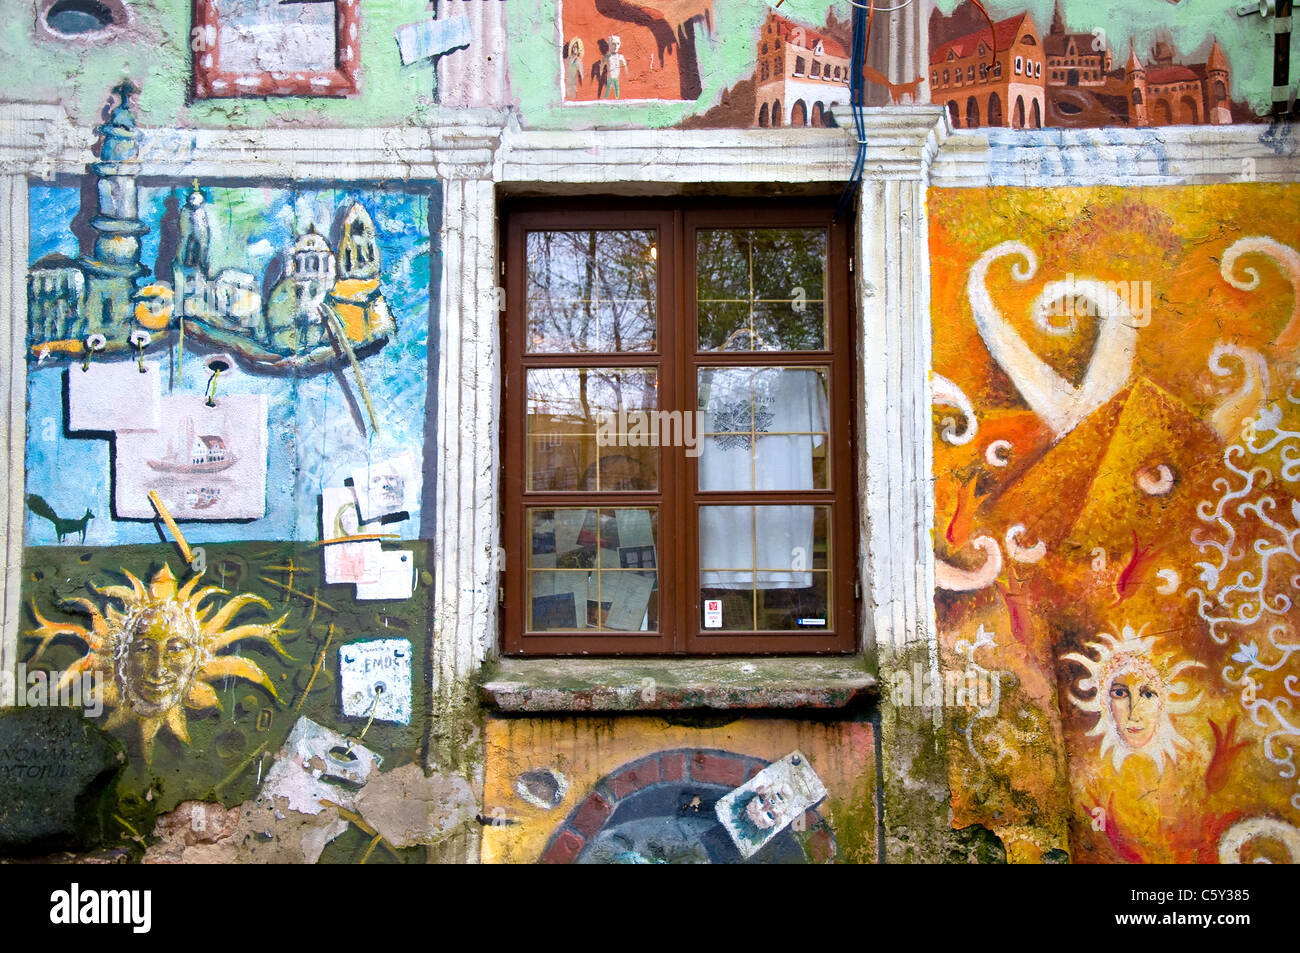 Art Gallery, Uzupis, Vilnius, Lithuania - Stock Image